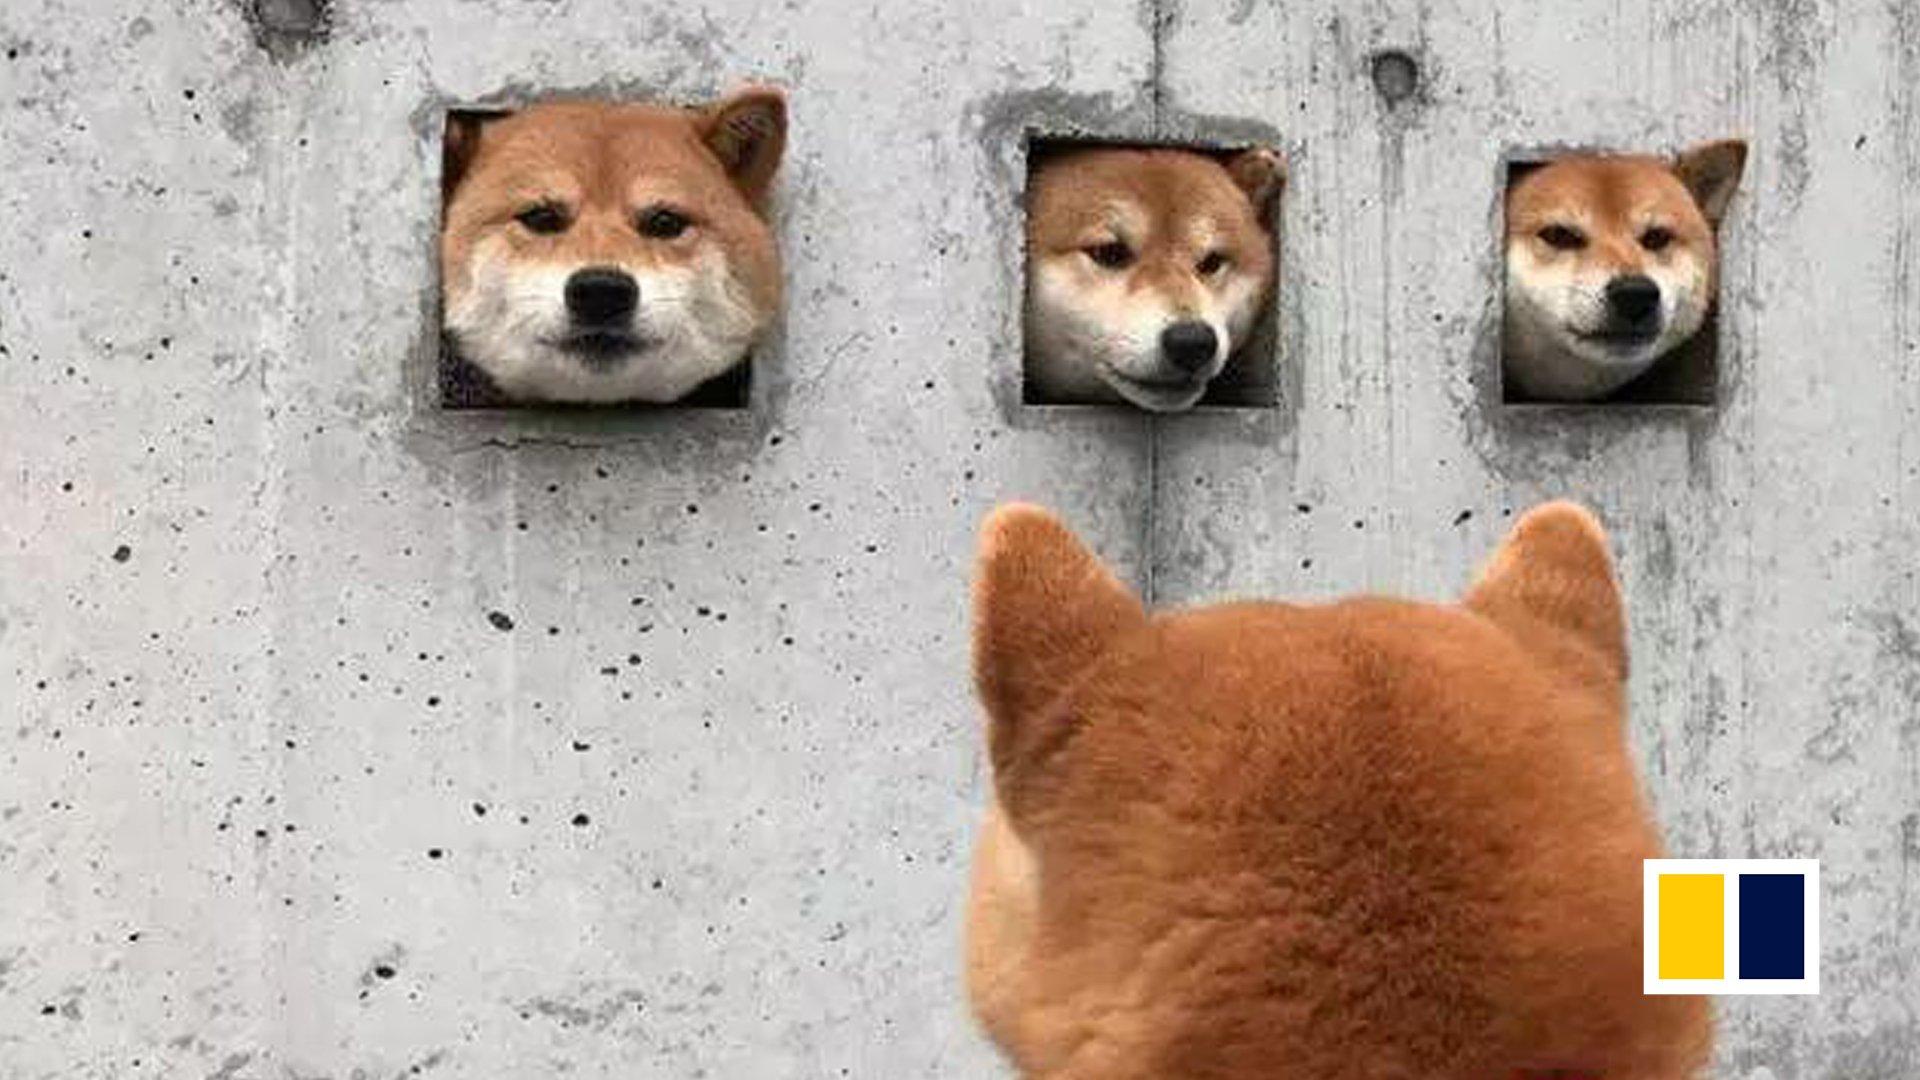 An Unusual Attraction In Japan Three Shiba Inus Peeking Out